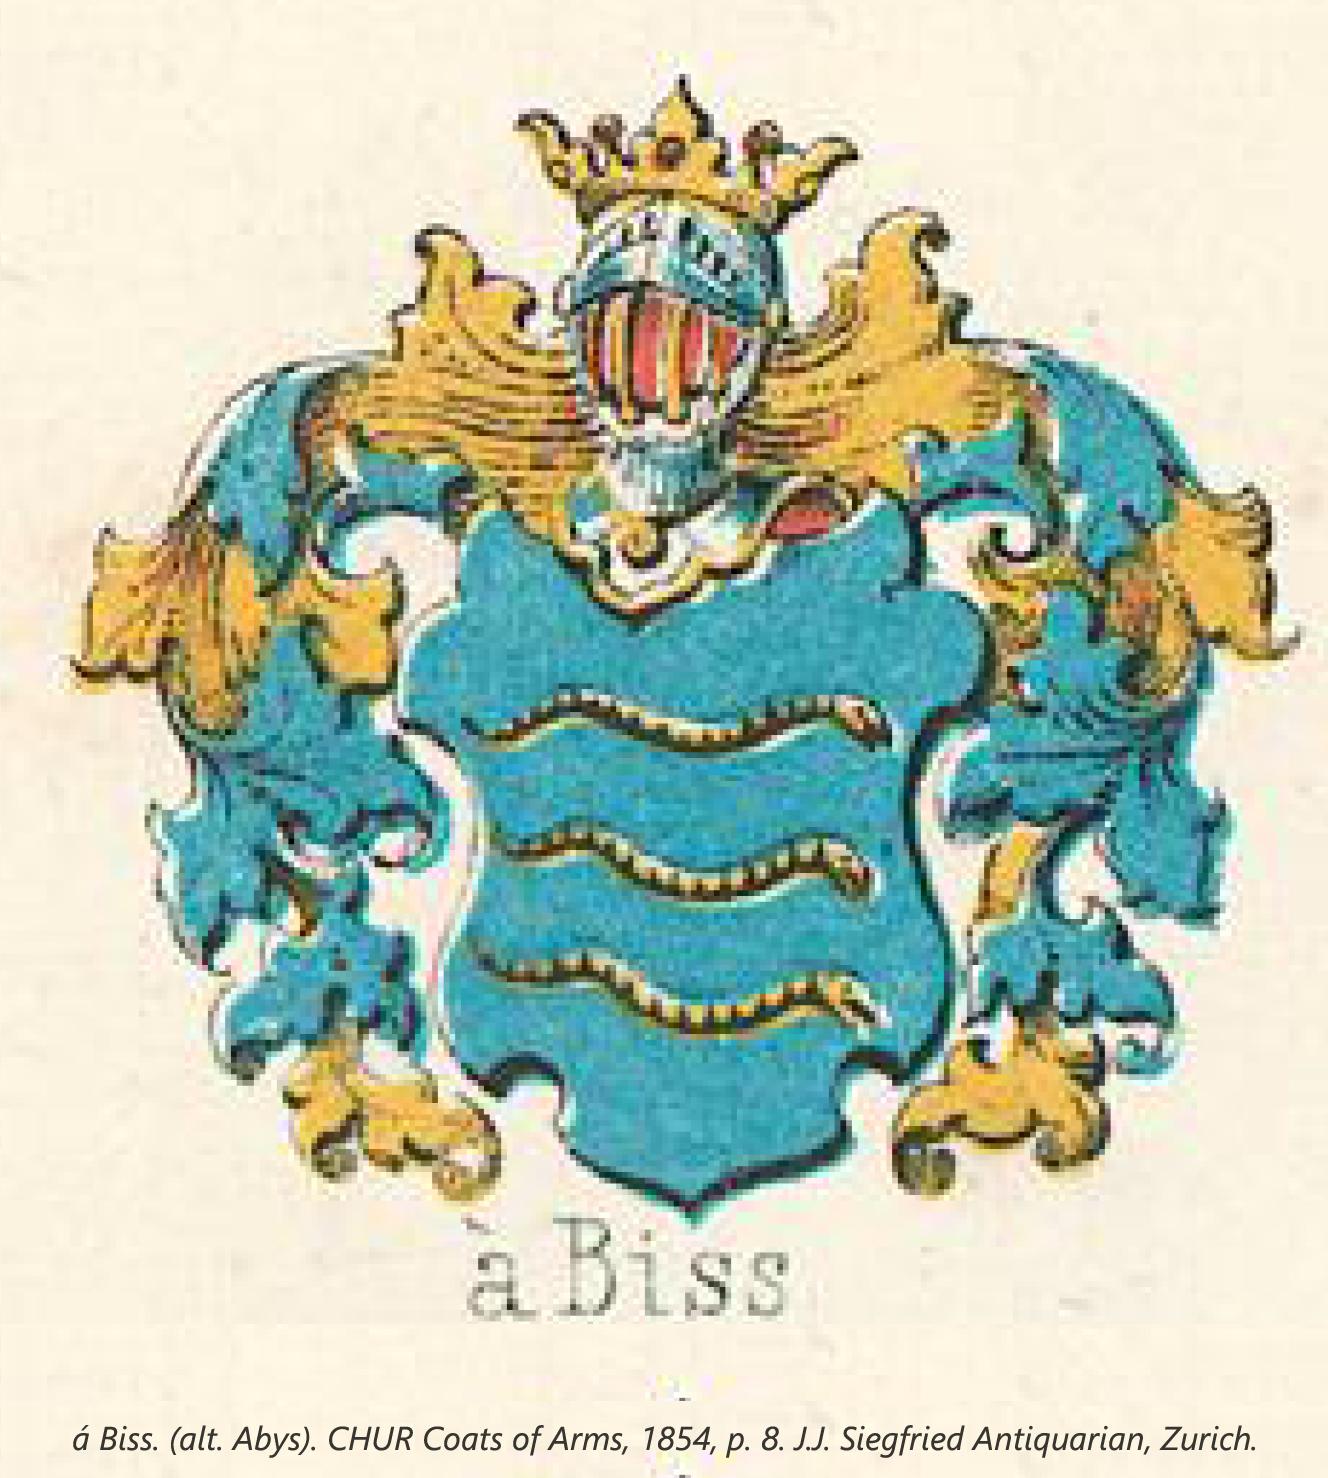 Abysvel, Abifs. (alt. Abys). CHUR Coats of Arms, 1854, p. 8. J.J. Siegfried Antiquarian, Zurich.